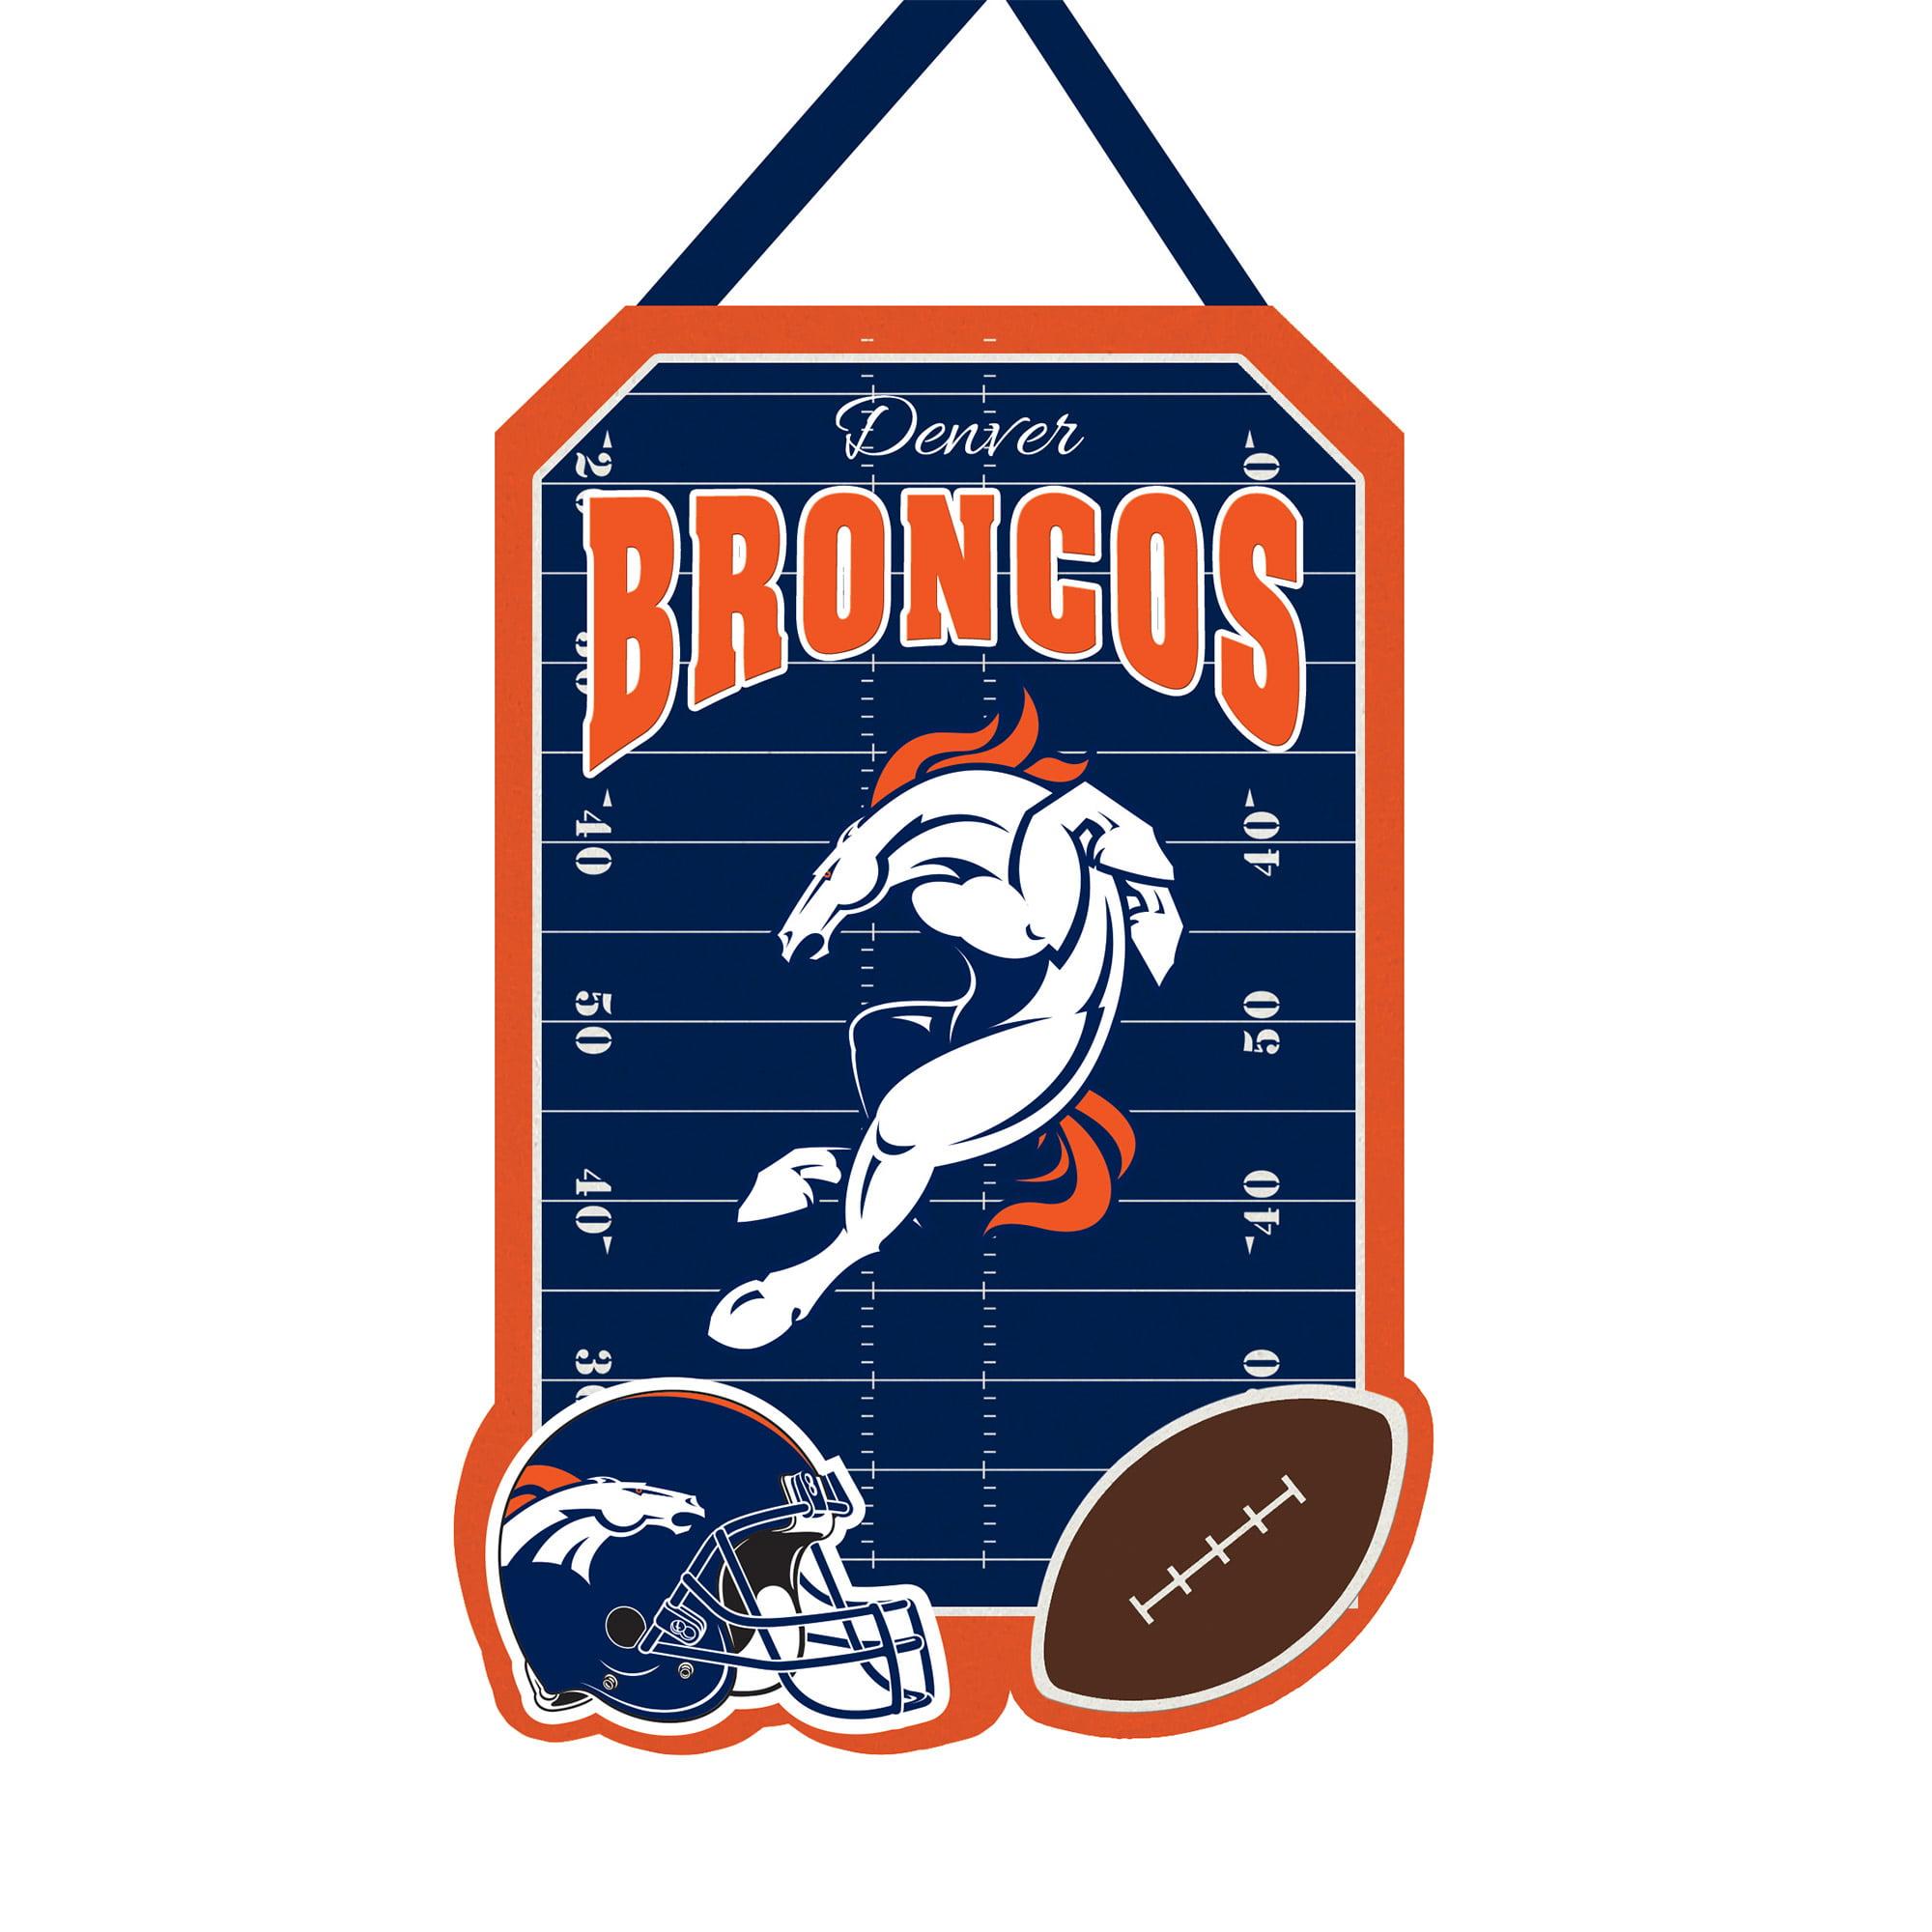 "Denver Broncos 20.5"" x 16.5"" Felt Door Decor Wall Banner - No Size"